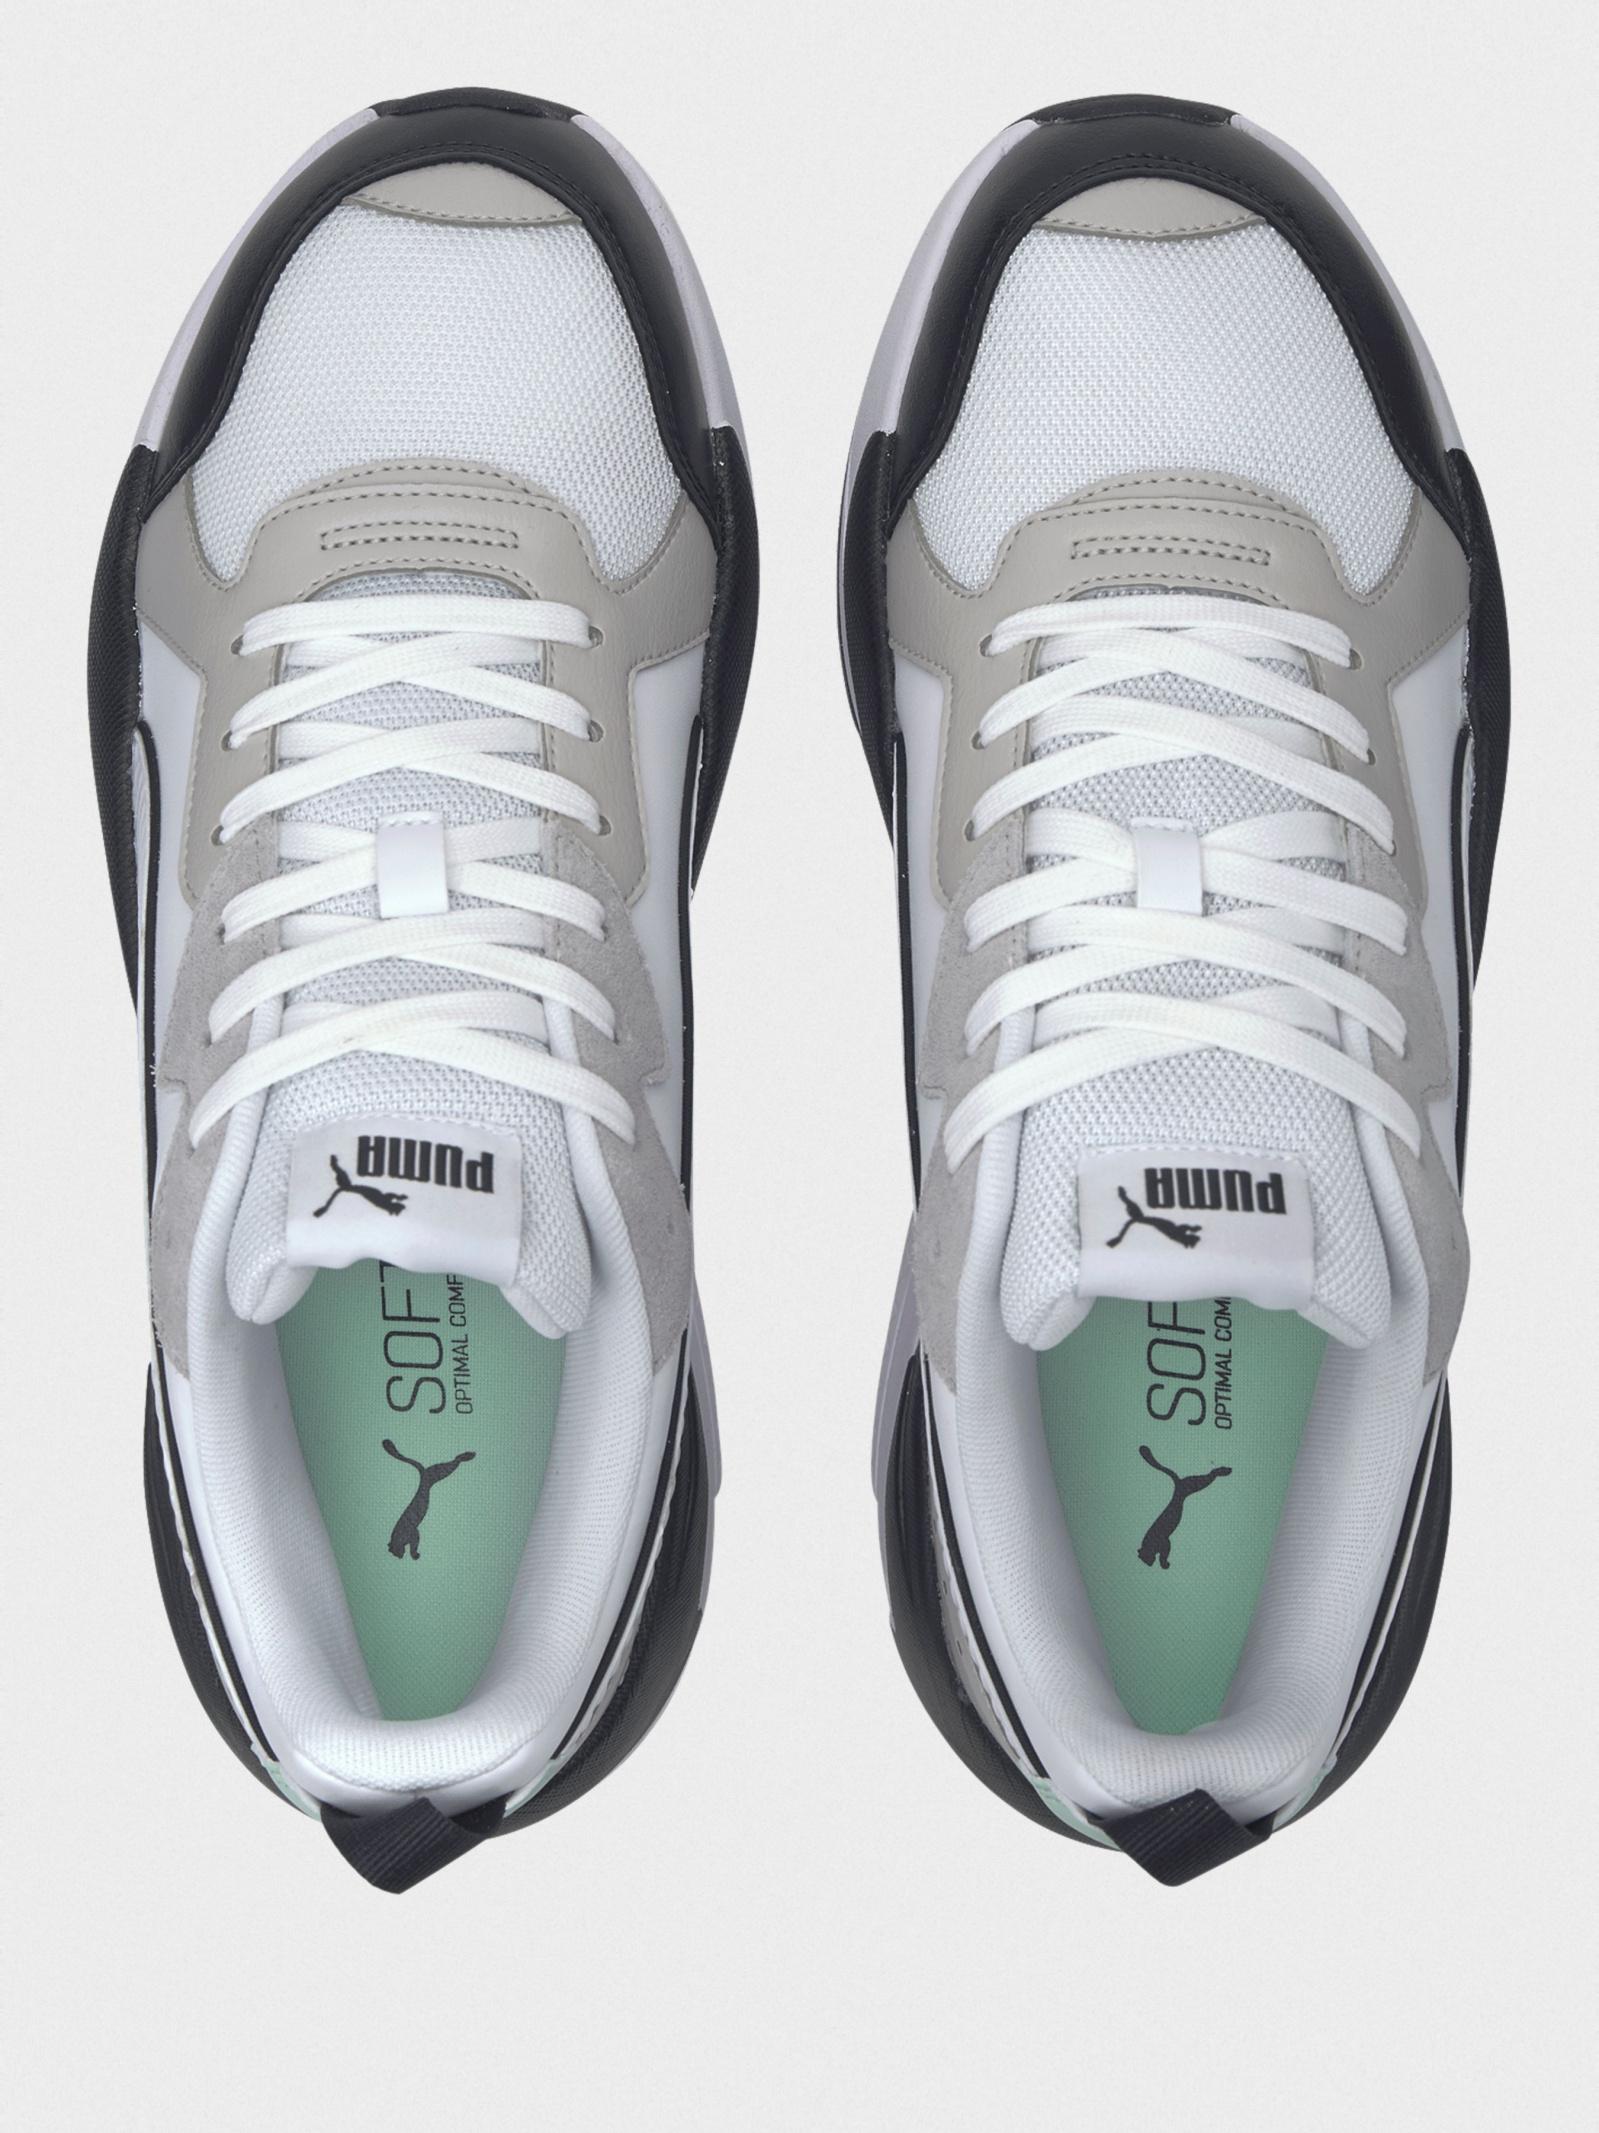 Кроссовки для мужчин PUMA X-Ray Game 37284902 купить в Интертоп, 2017